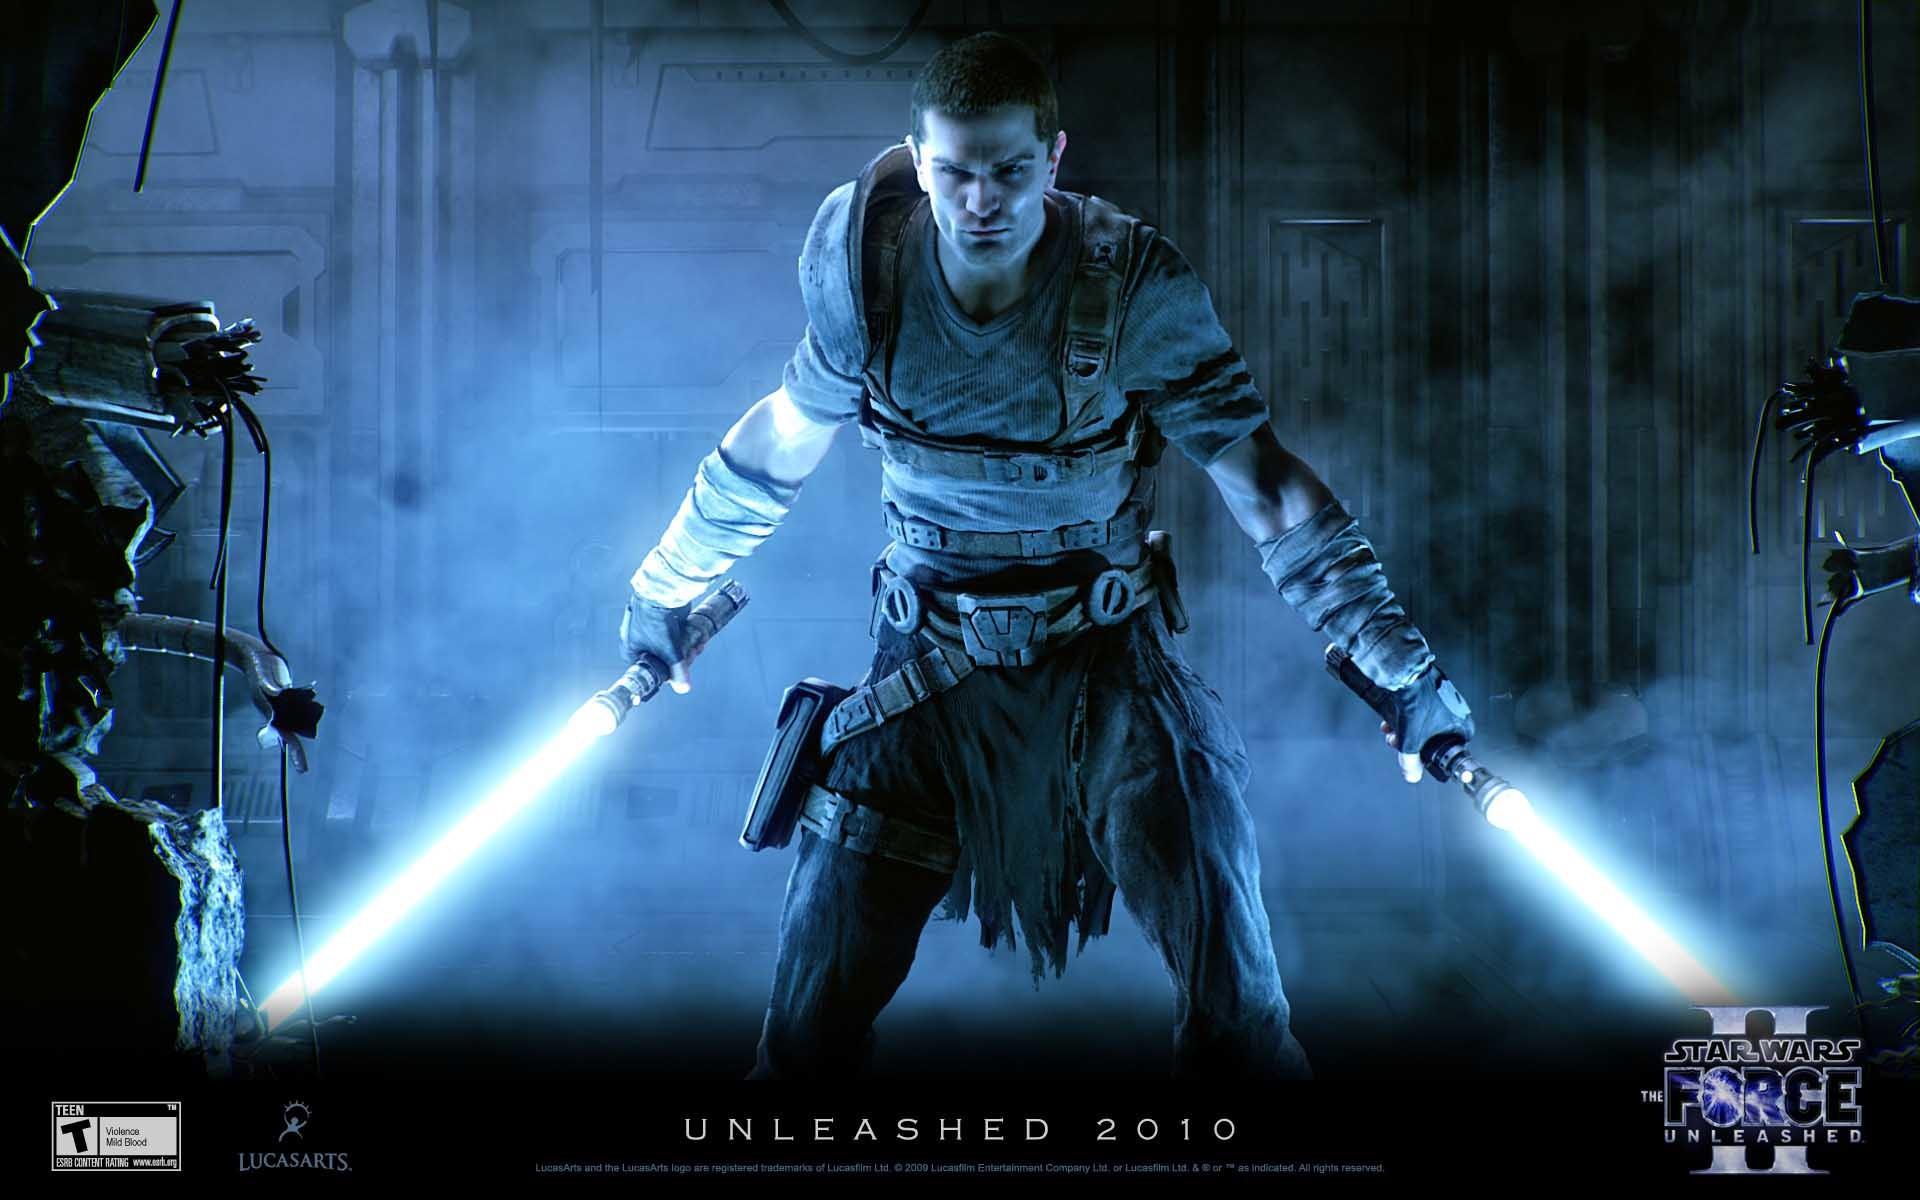 Star Wars: The Force Unleashed II – Starkiller